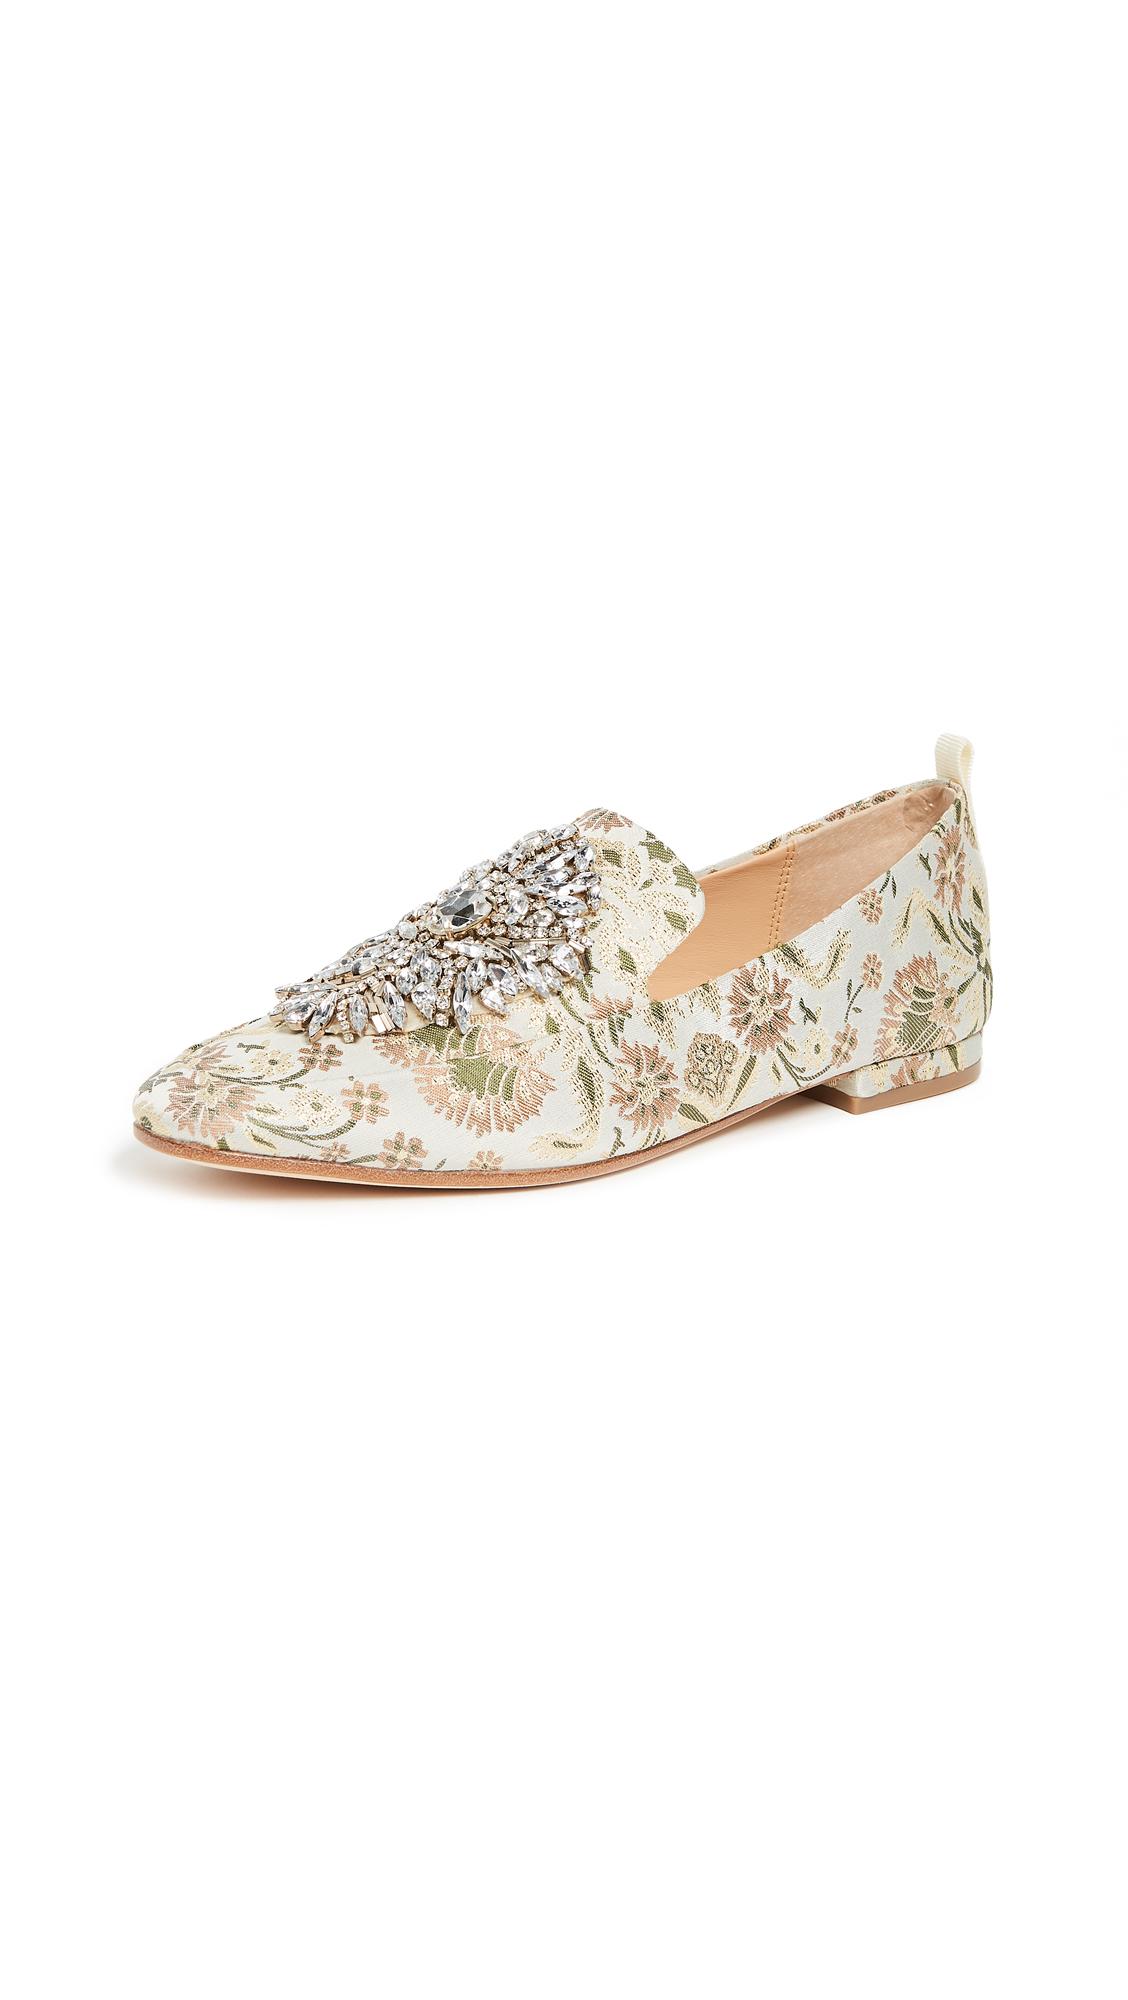 Badgley Mischka Salma Printed Loafers - Ivory